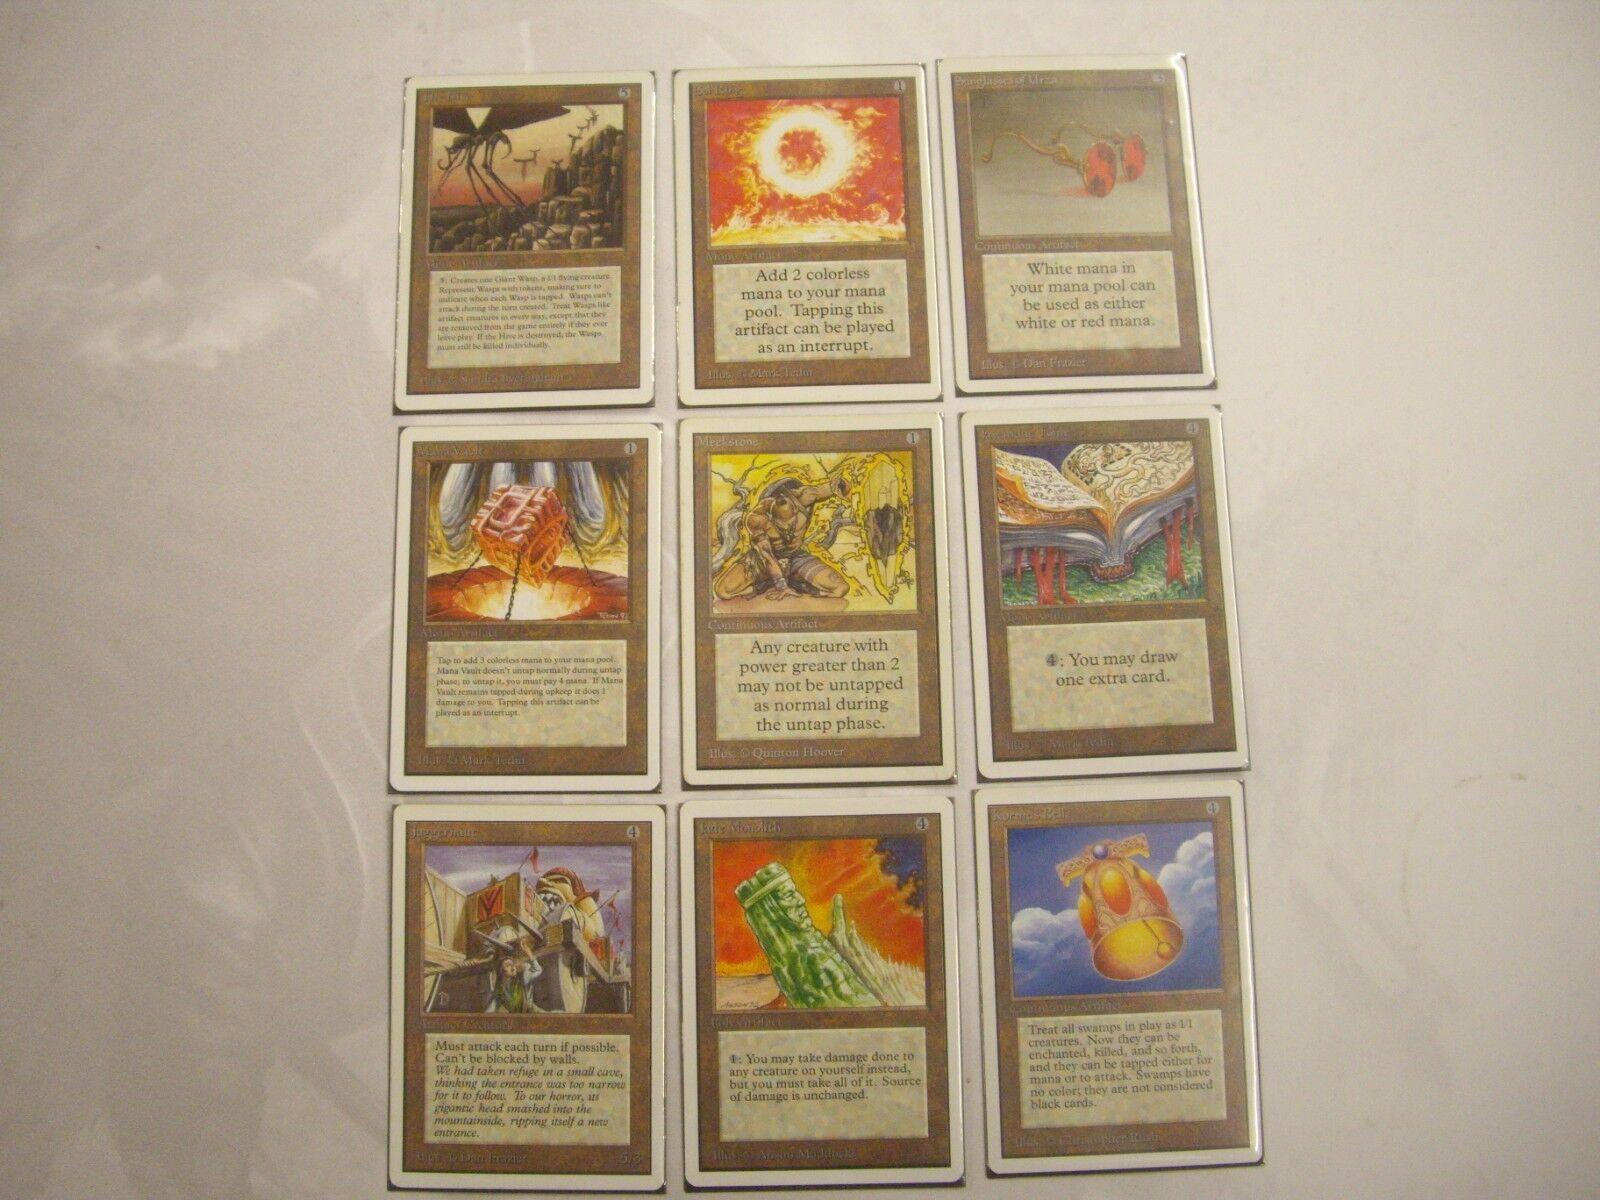 Mtg magie mega - multilist, unbegrenzte ul old - school - 94   95 -   8.